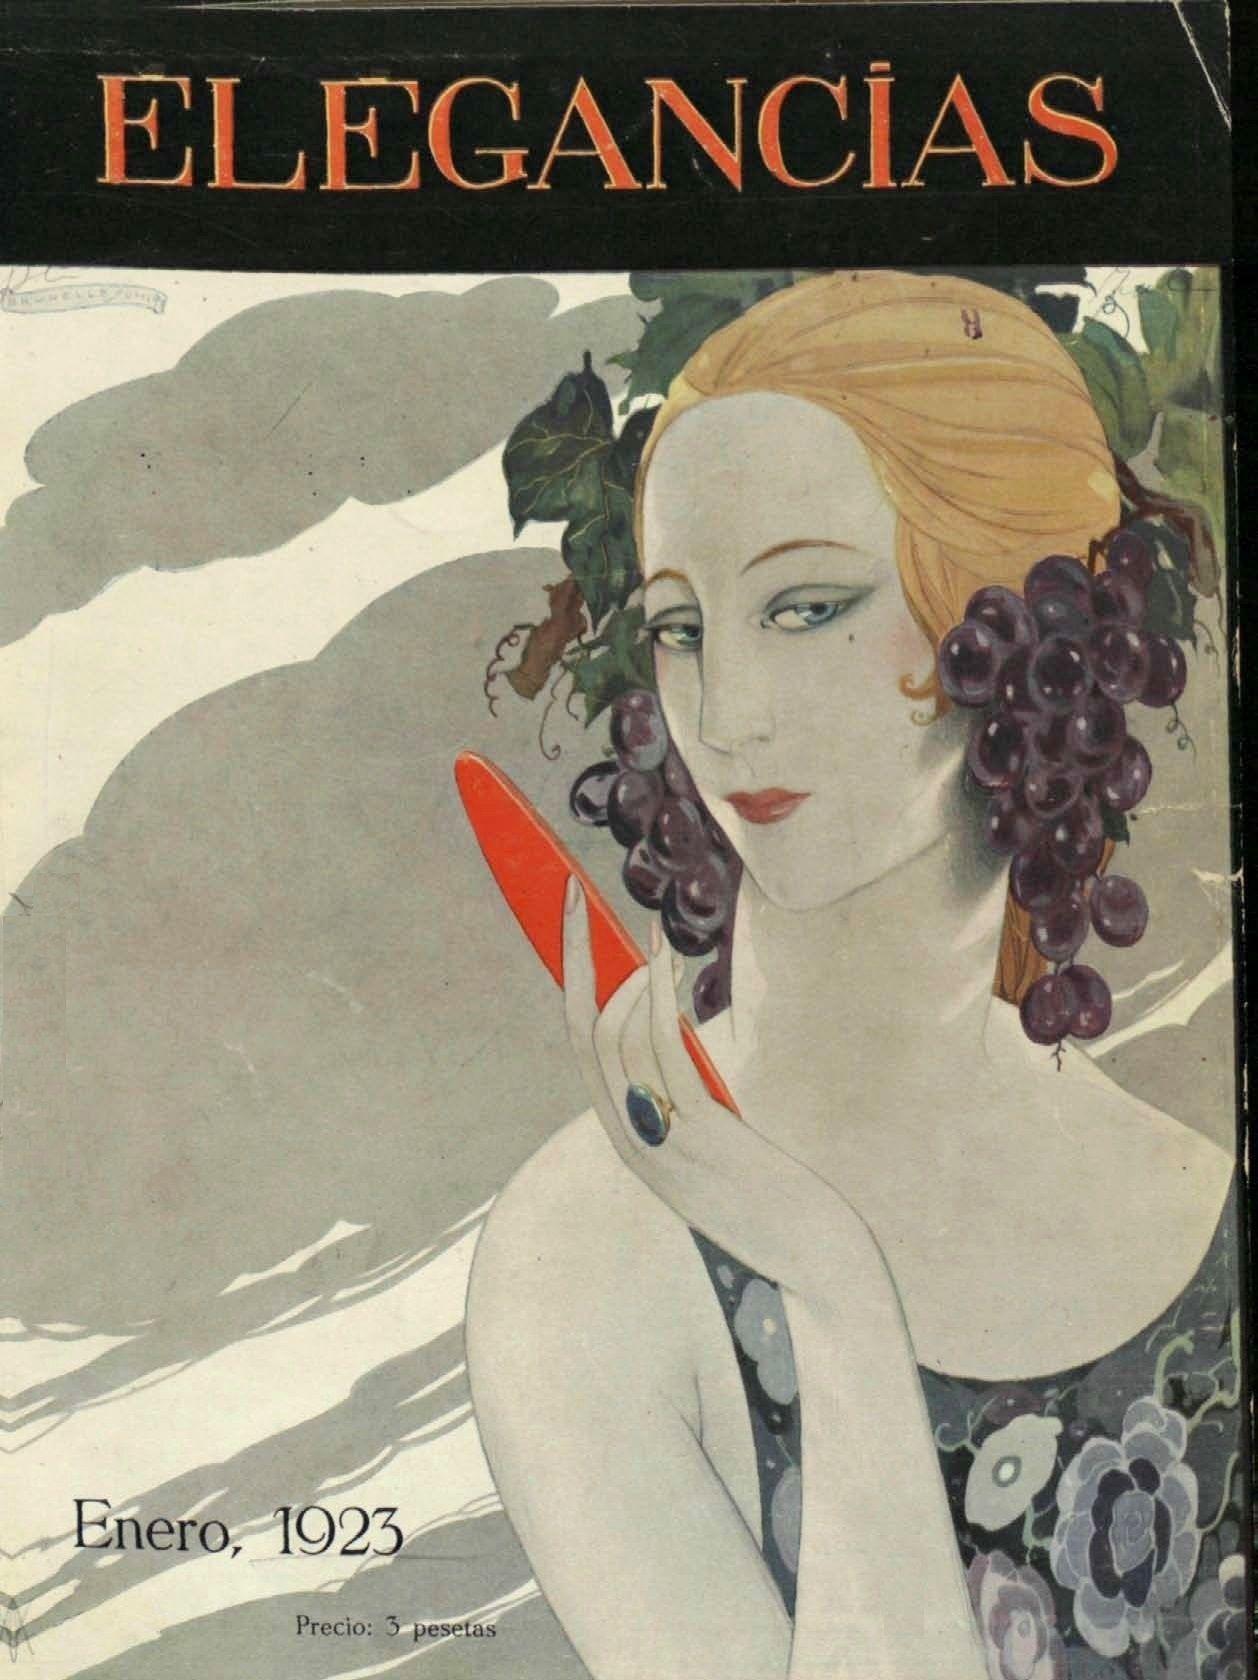 Elegancias (Madrid) - 1923 - Portada de Brunelleschi